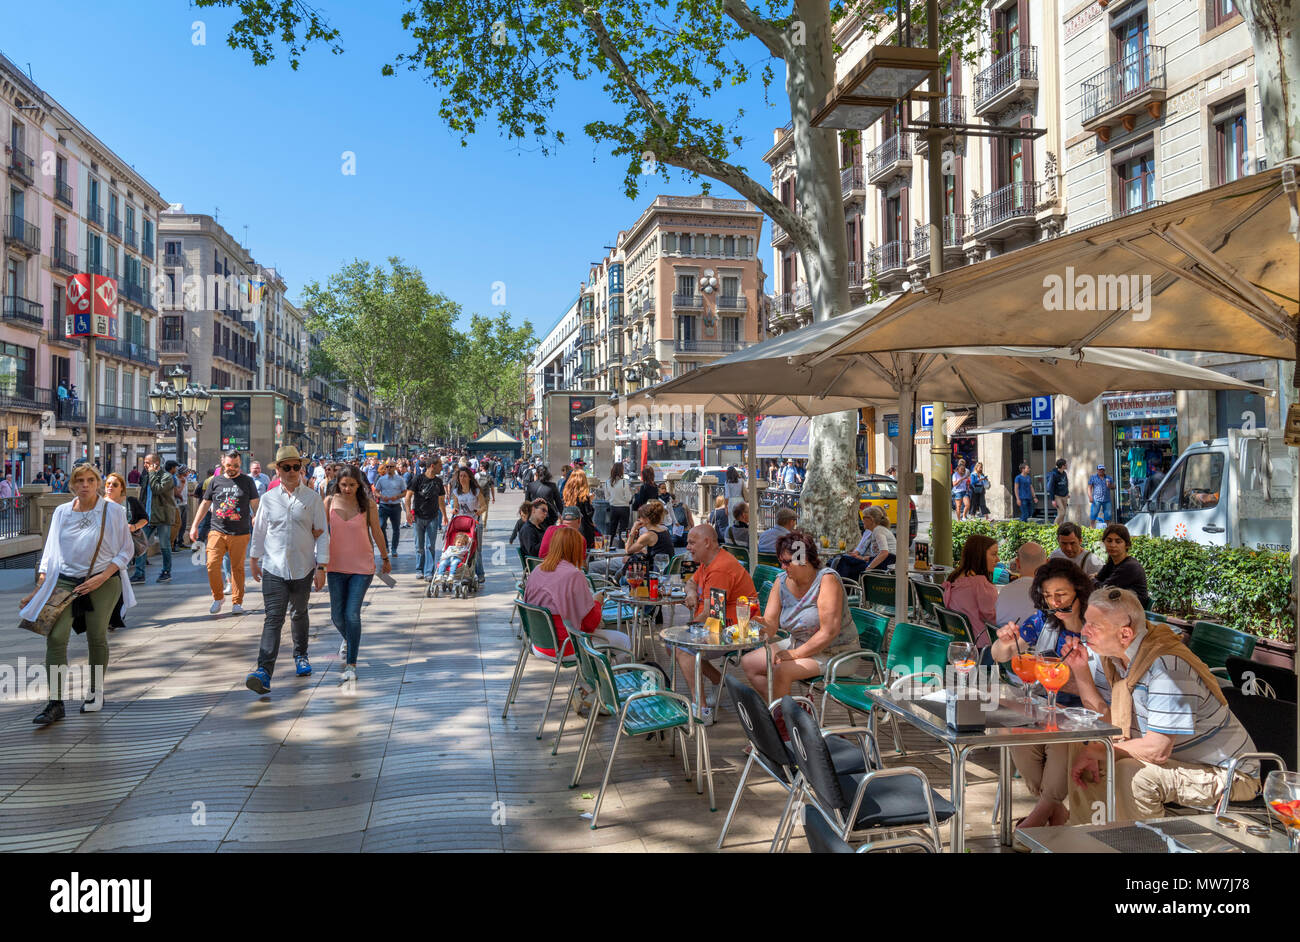 Las Ramblas, Barcelone. Cafe sur l'animée Rambla dels Caputxins, Barcelone, Catalogne, Espagne. Photo Stock